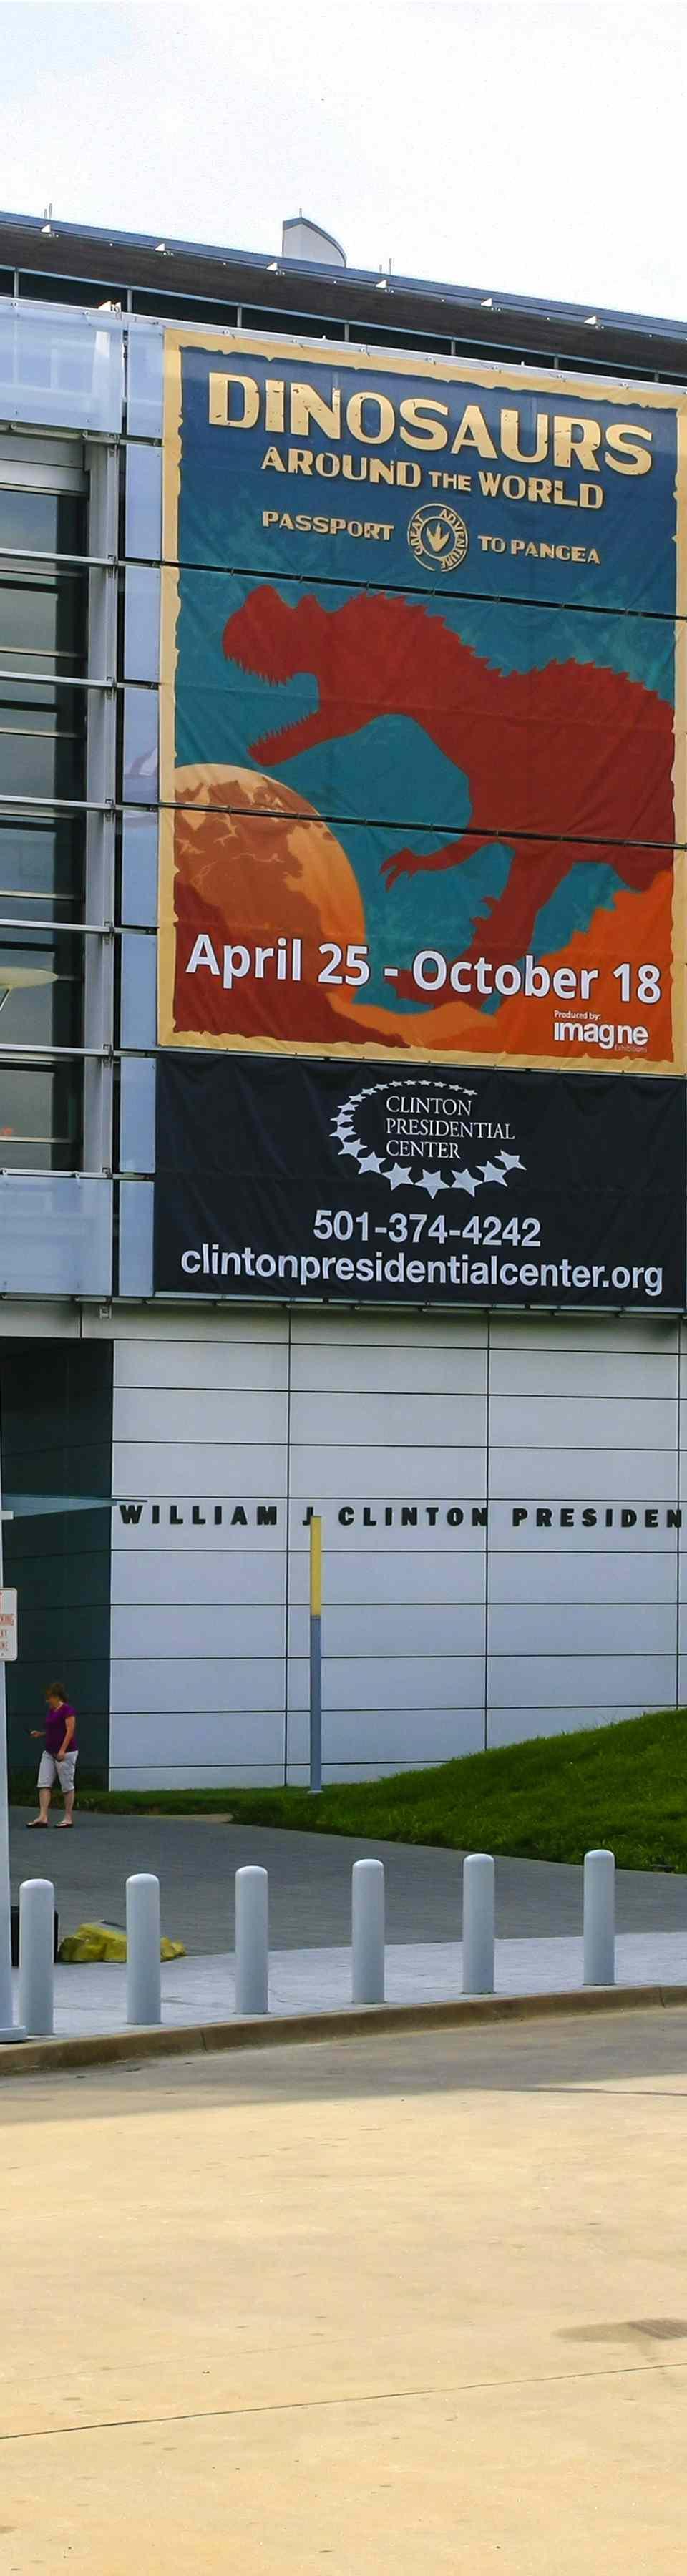 William J. Clinton Presidential Center building in Little Rock Arkansas